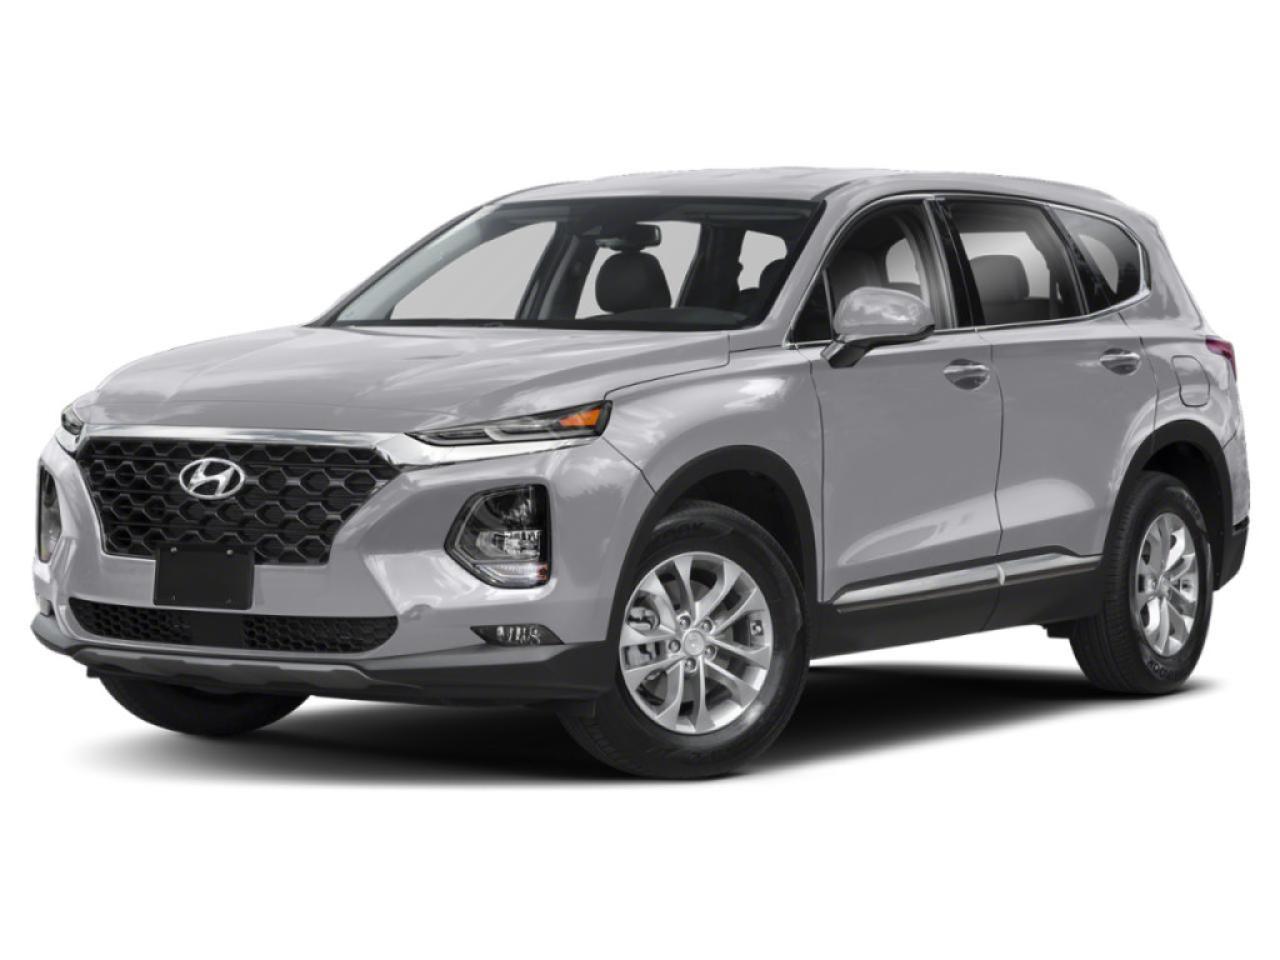 2019 Hyundai Santa Fe 2.0T Preferred AWD PANORAMIC SUNROOF